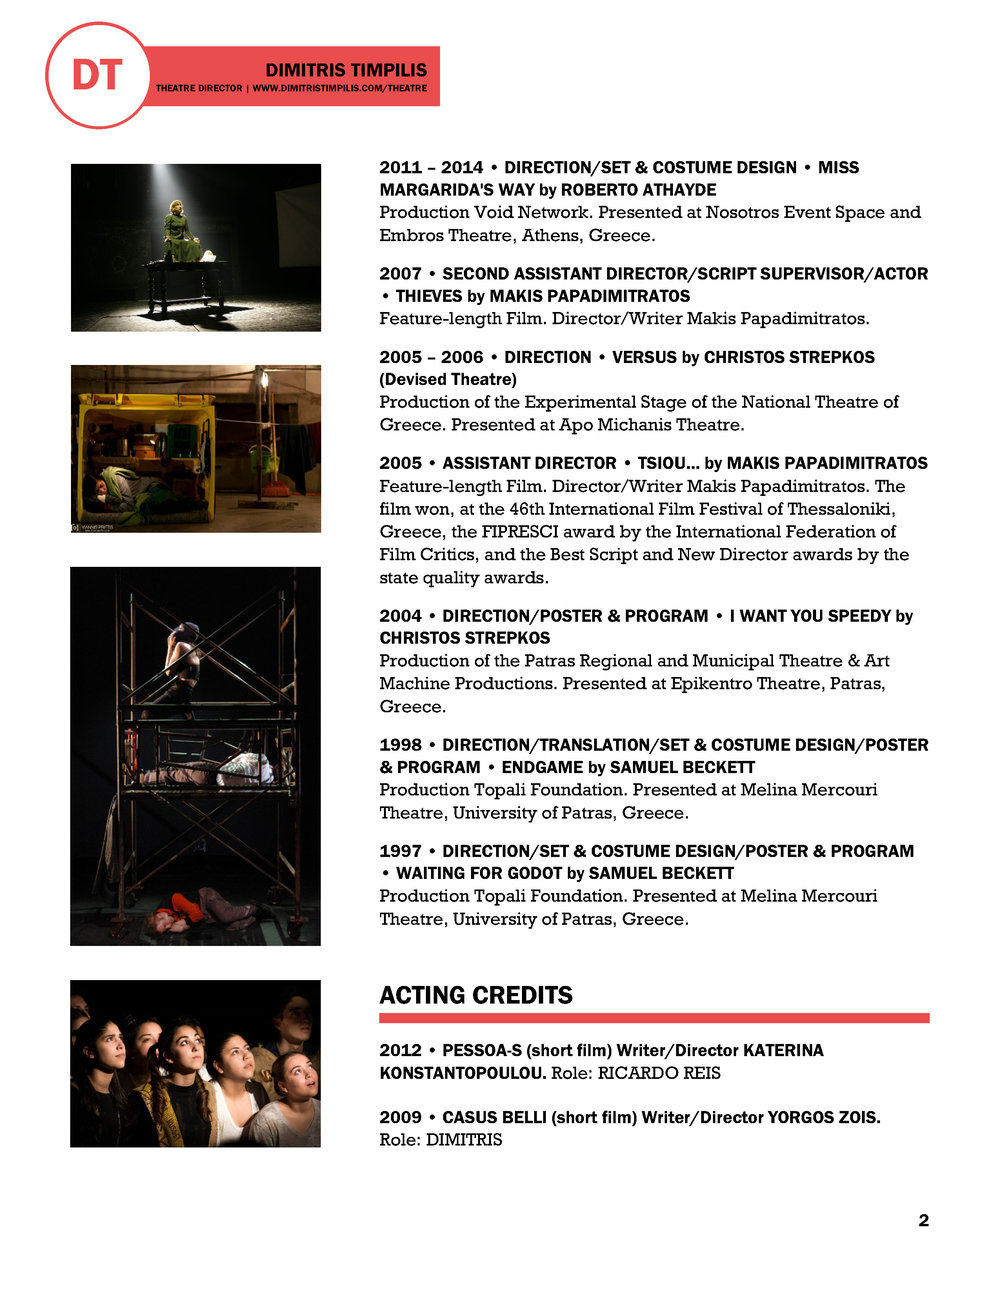 Dimitris Timpilis CV Theatre Director (2018)_Page_2.jpg